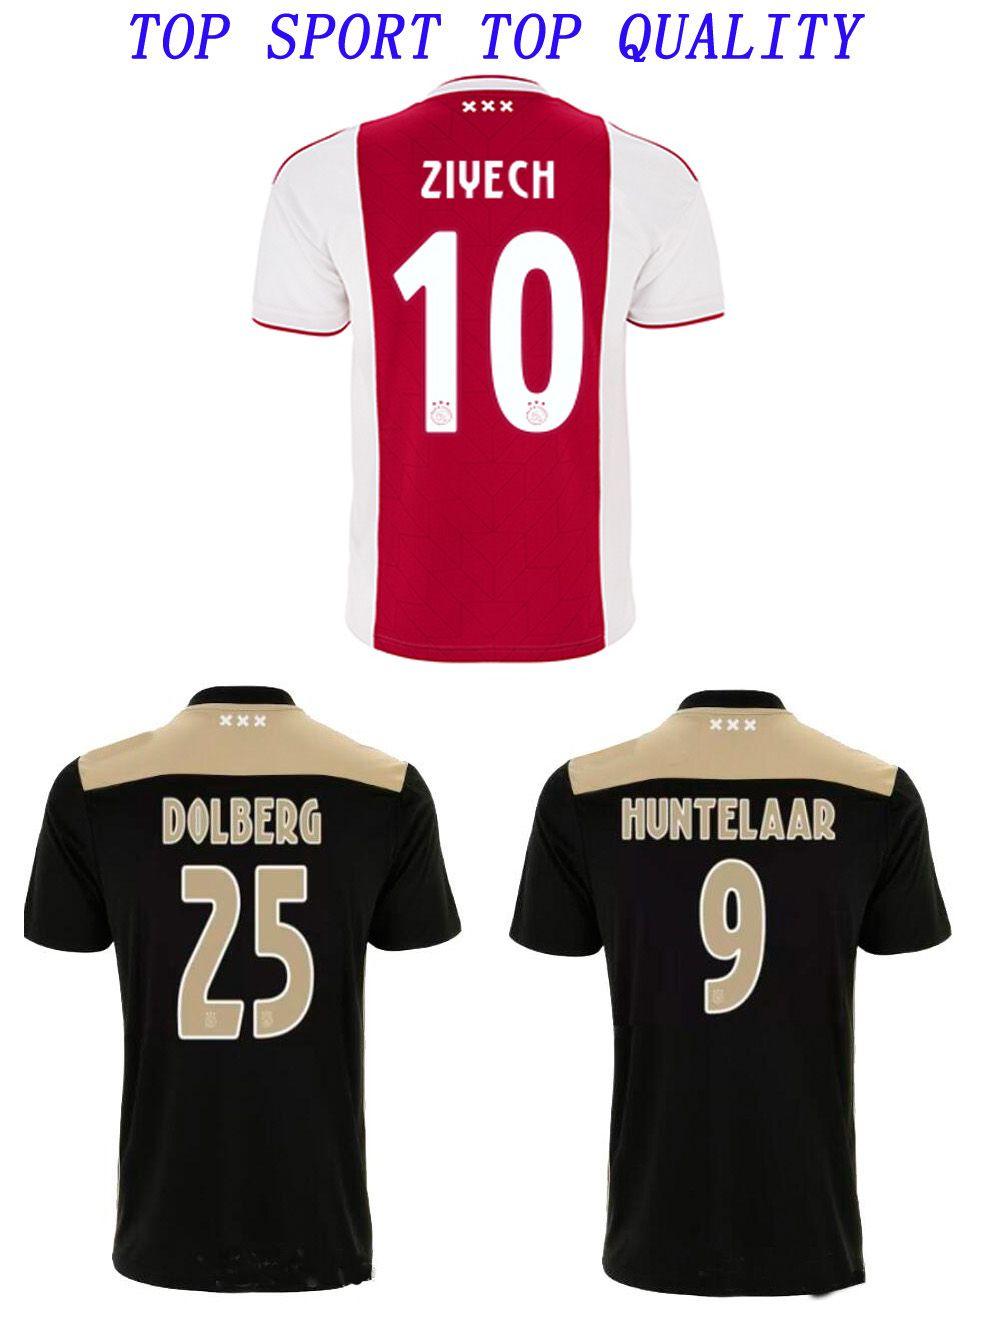 ffa1d8a2b 2019 New Ajax Soccer Jerseys 2018 2019 Ajax FC ZIYECH DOLBERG SCHONE NOURI  HUNTELAAR VAN DE BEEK Football Shirts Adult Thai Quality Soccer Wear From  ...